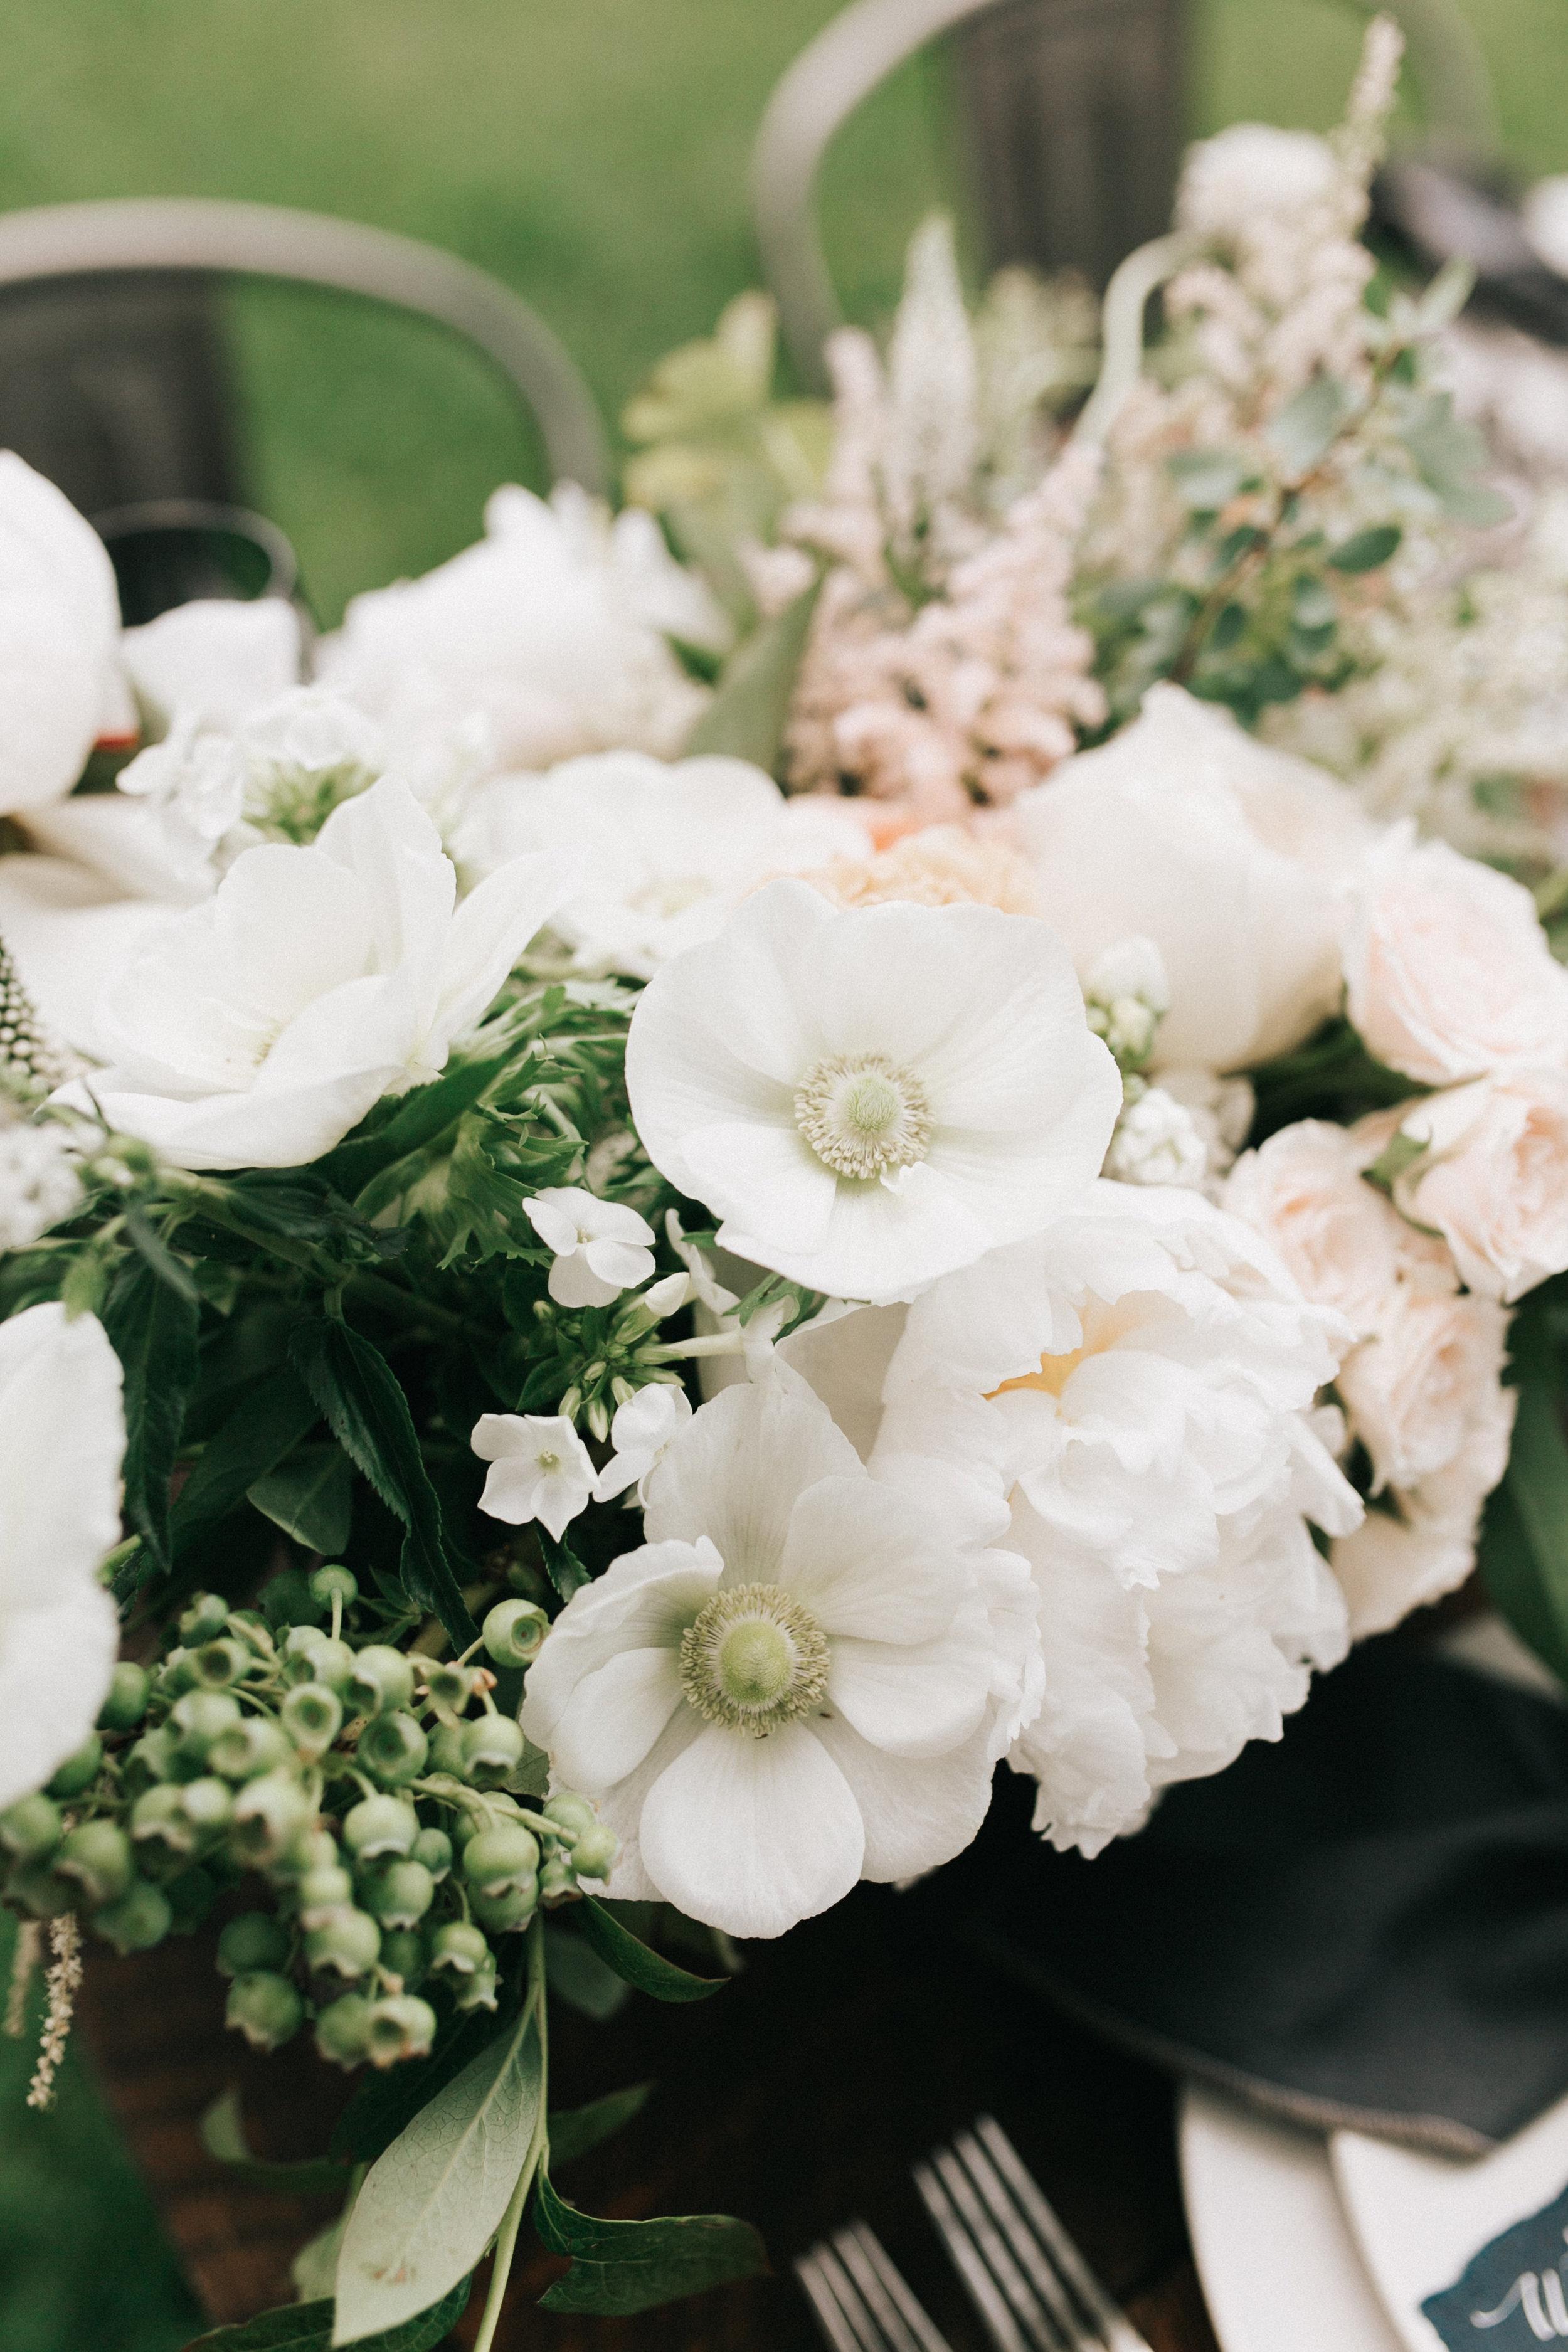 Watershed-Floral-Maine-Maritime-Wedding-Bridal-Bouquet-Centerpieces-0056.jpg